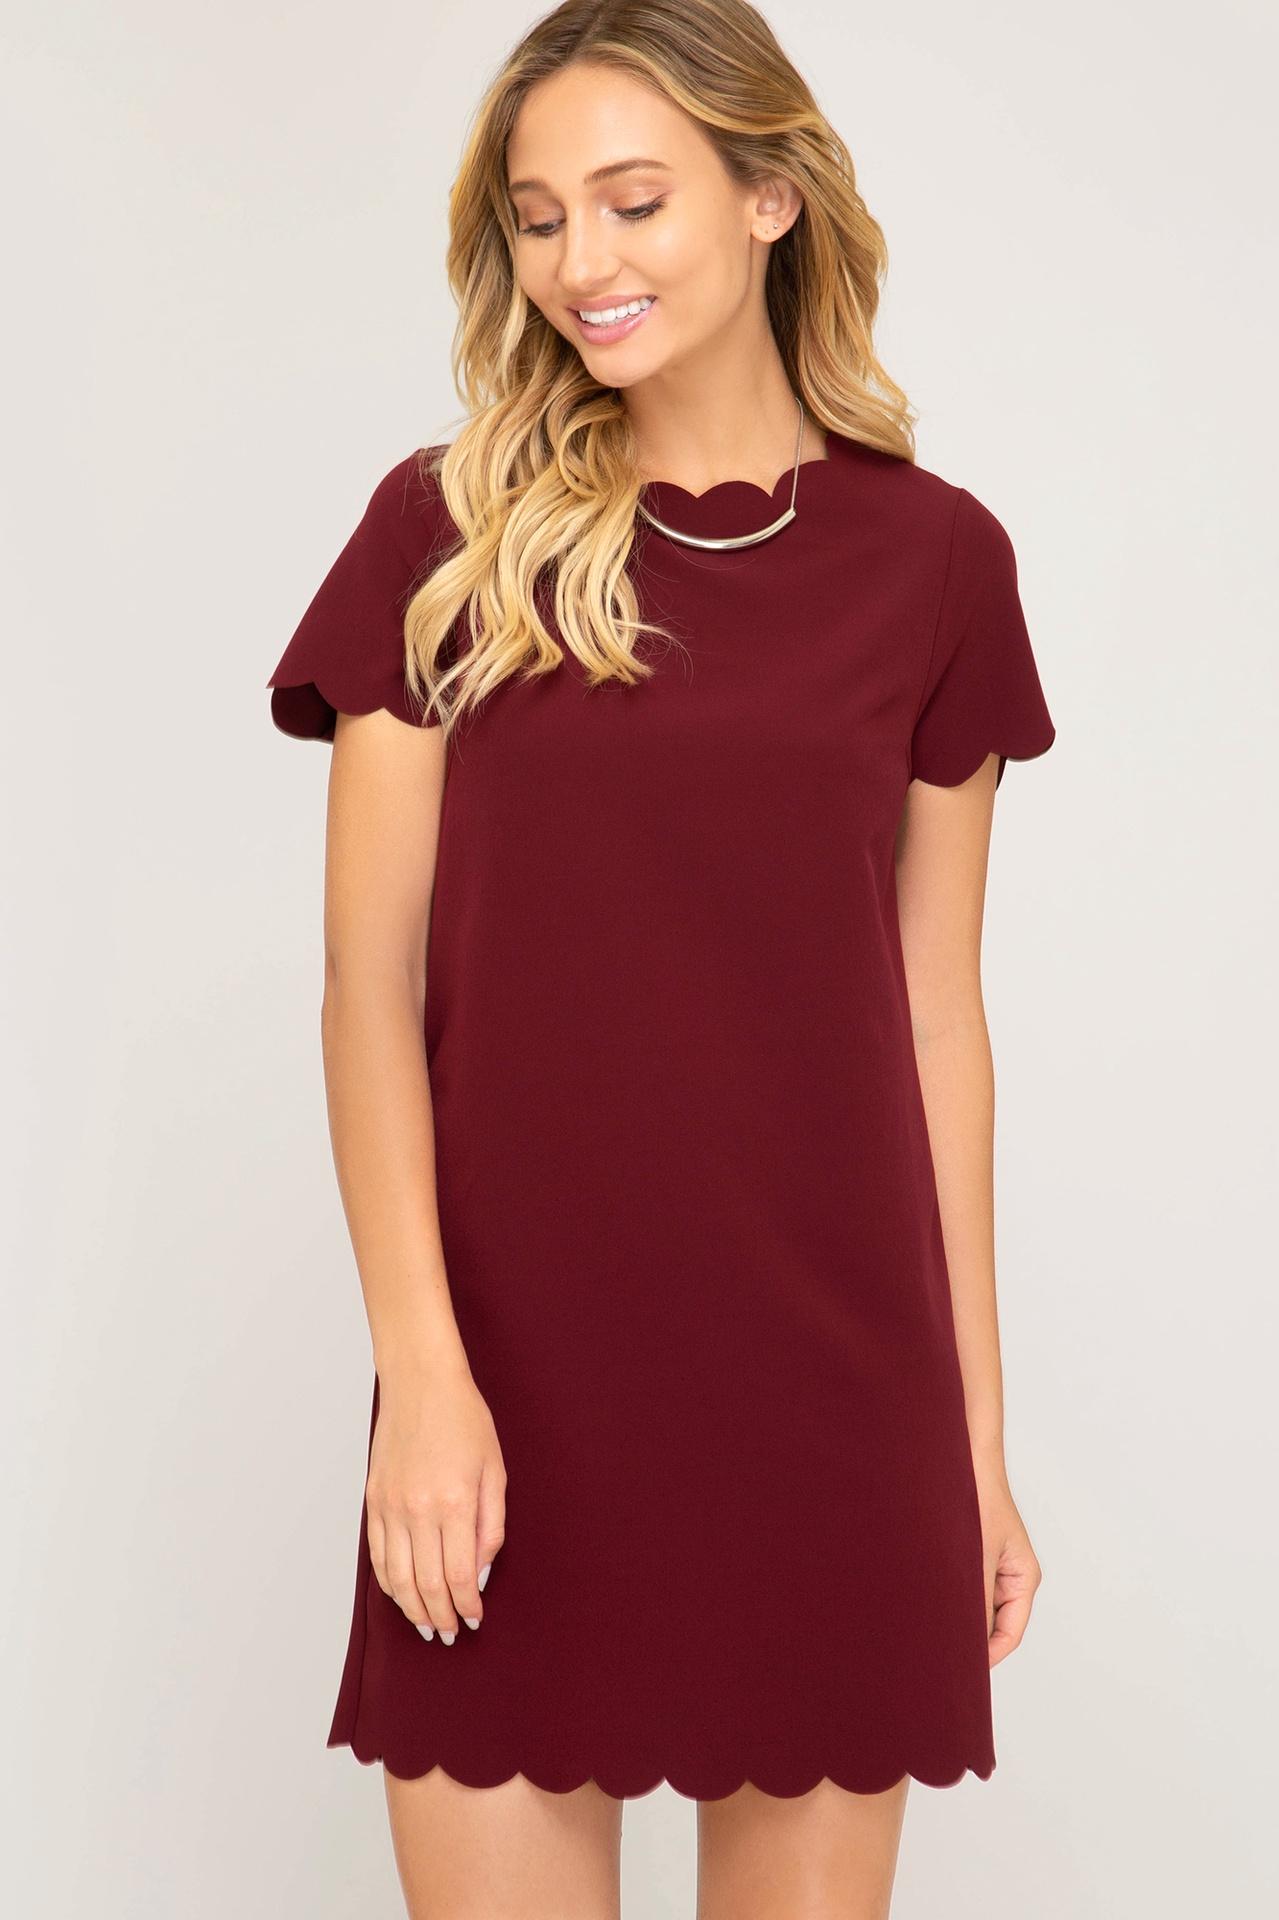 Wine S/S Dress w Scallop Neck